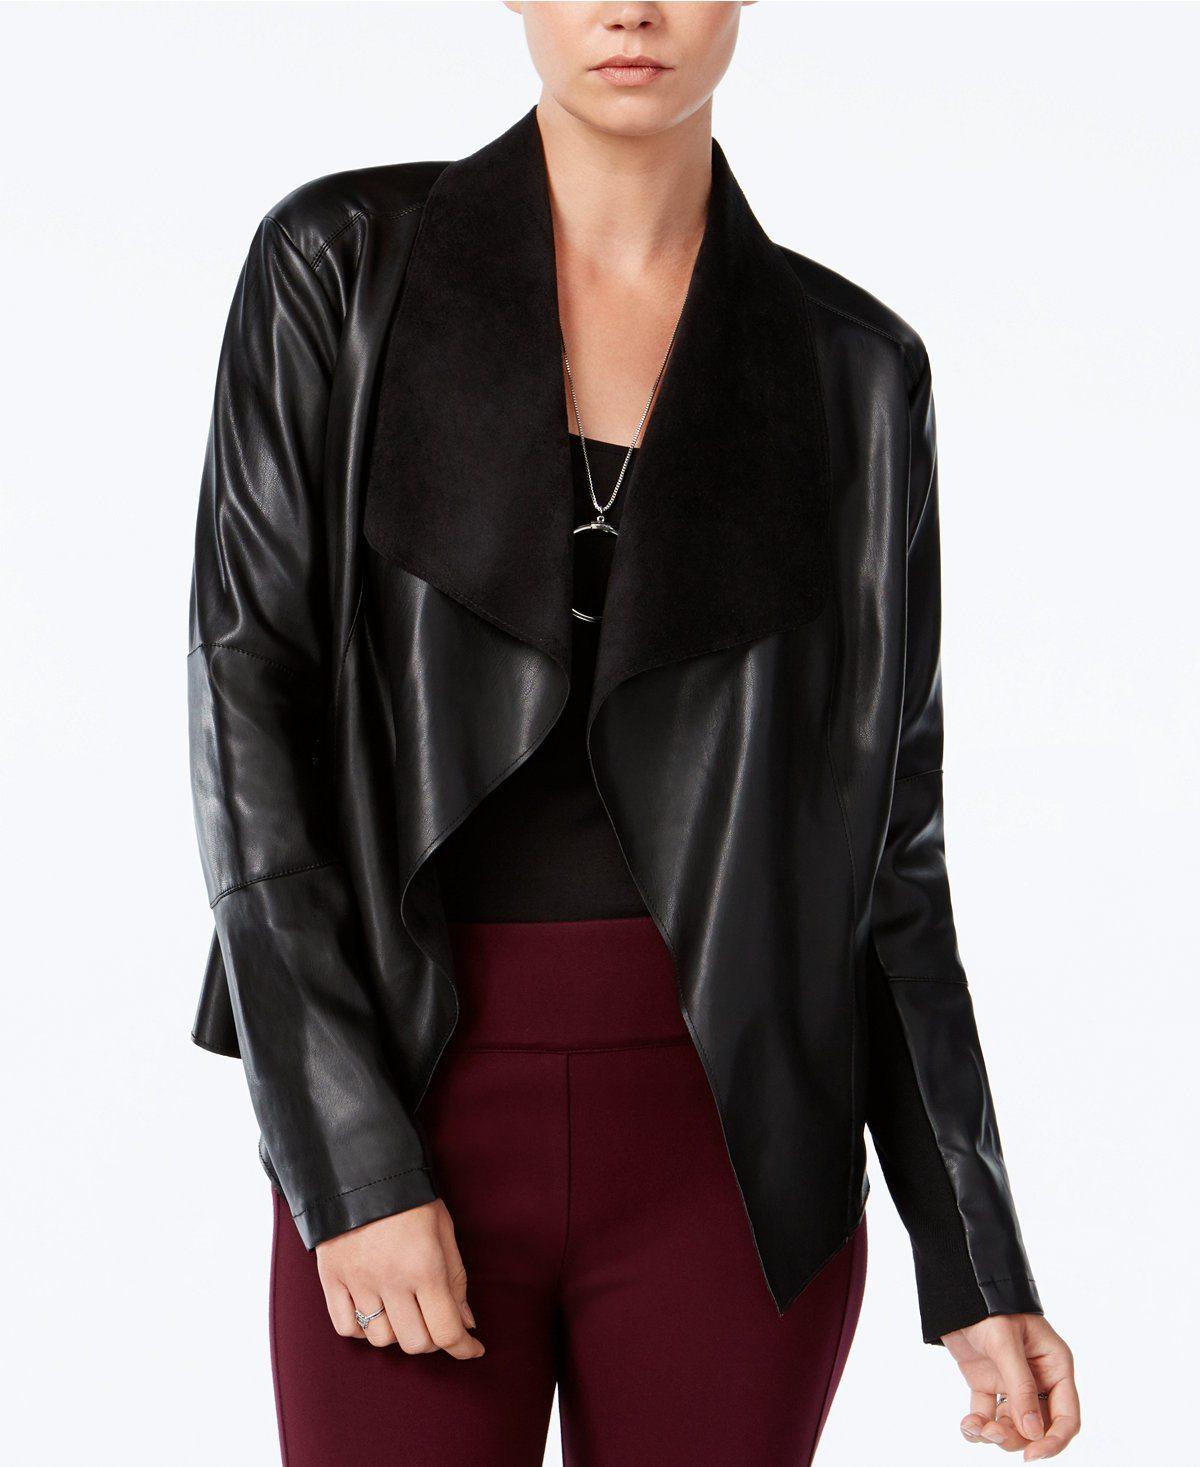 Macy's faux leather jacket